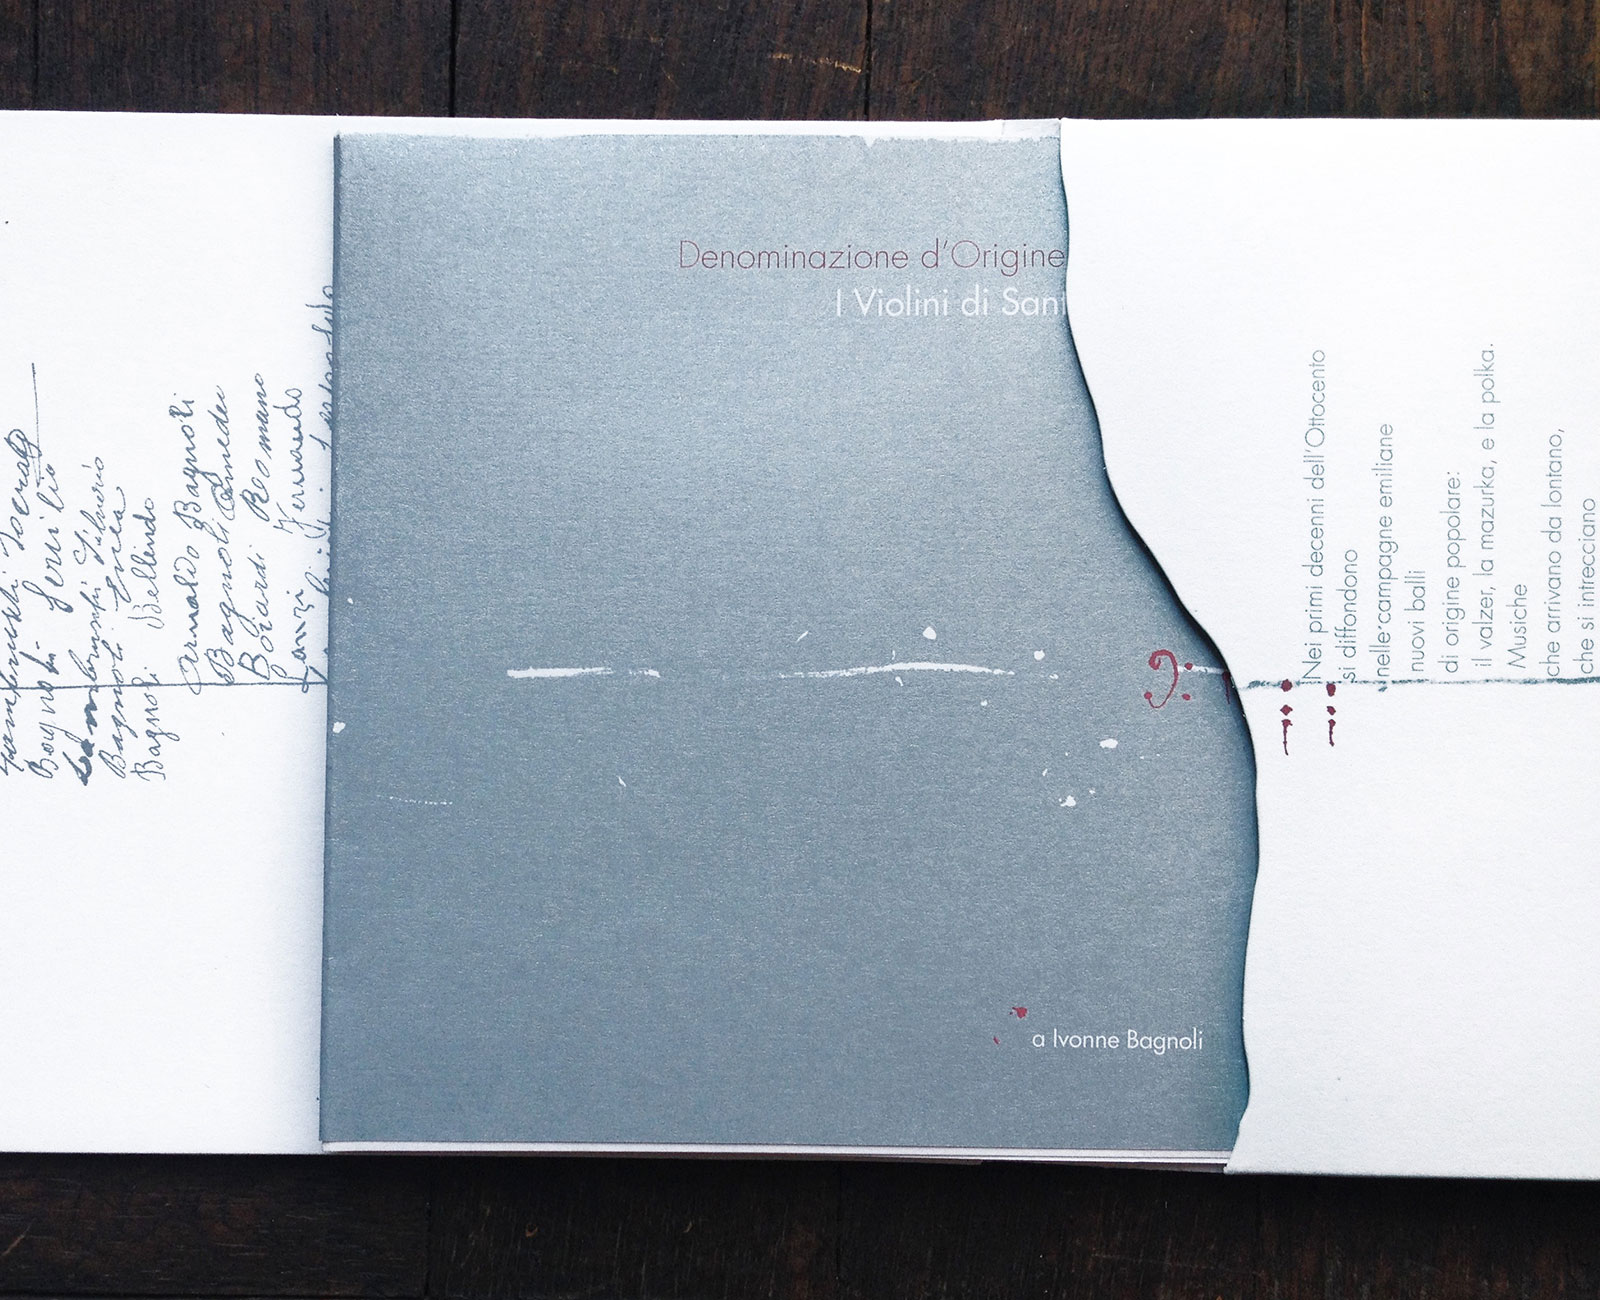 VIOLINI-SANTA-VITTORIA-CD-7